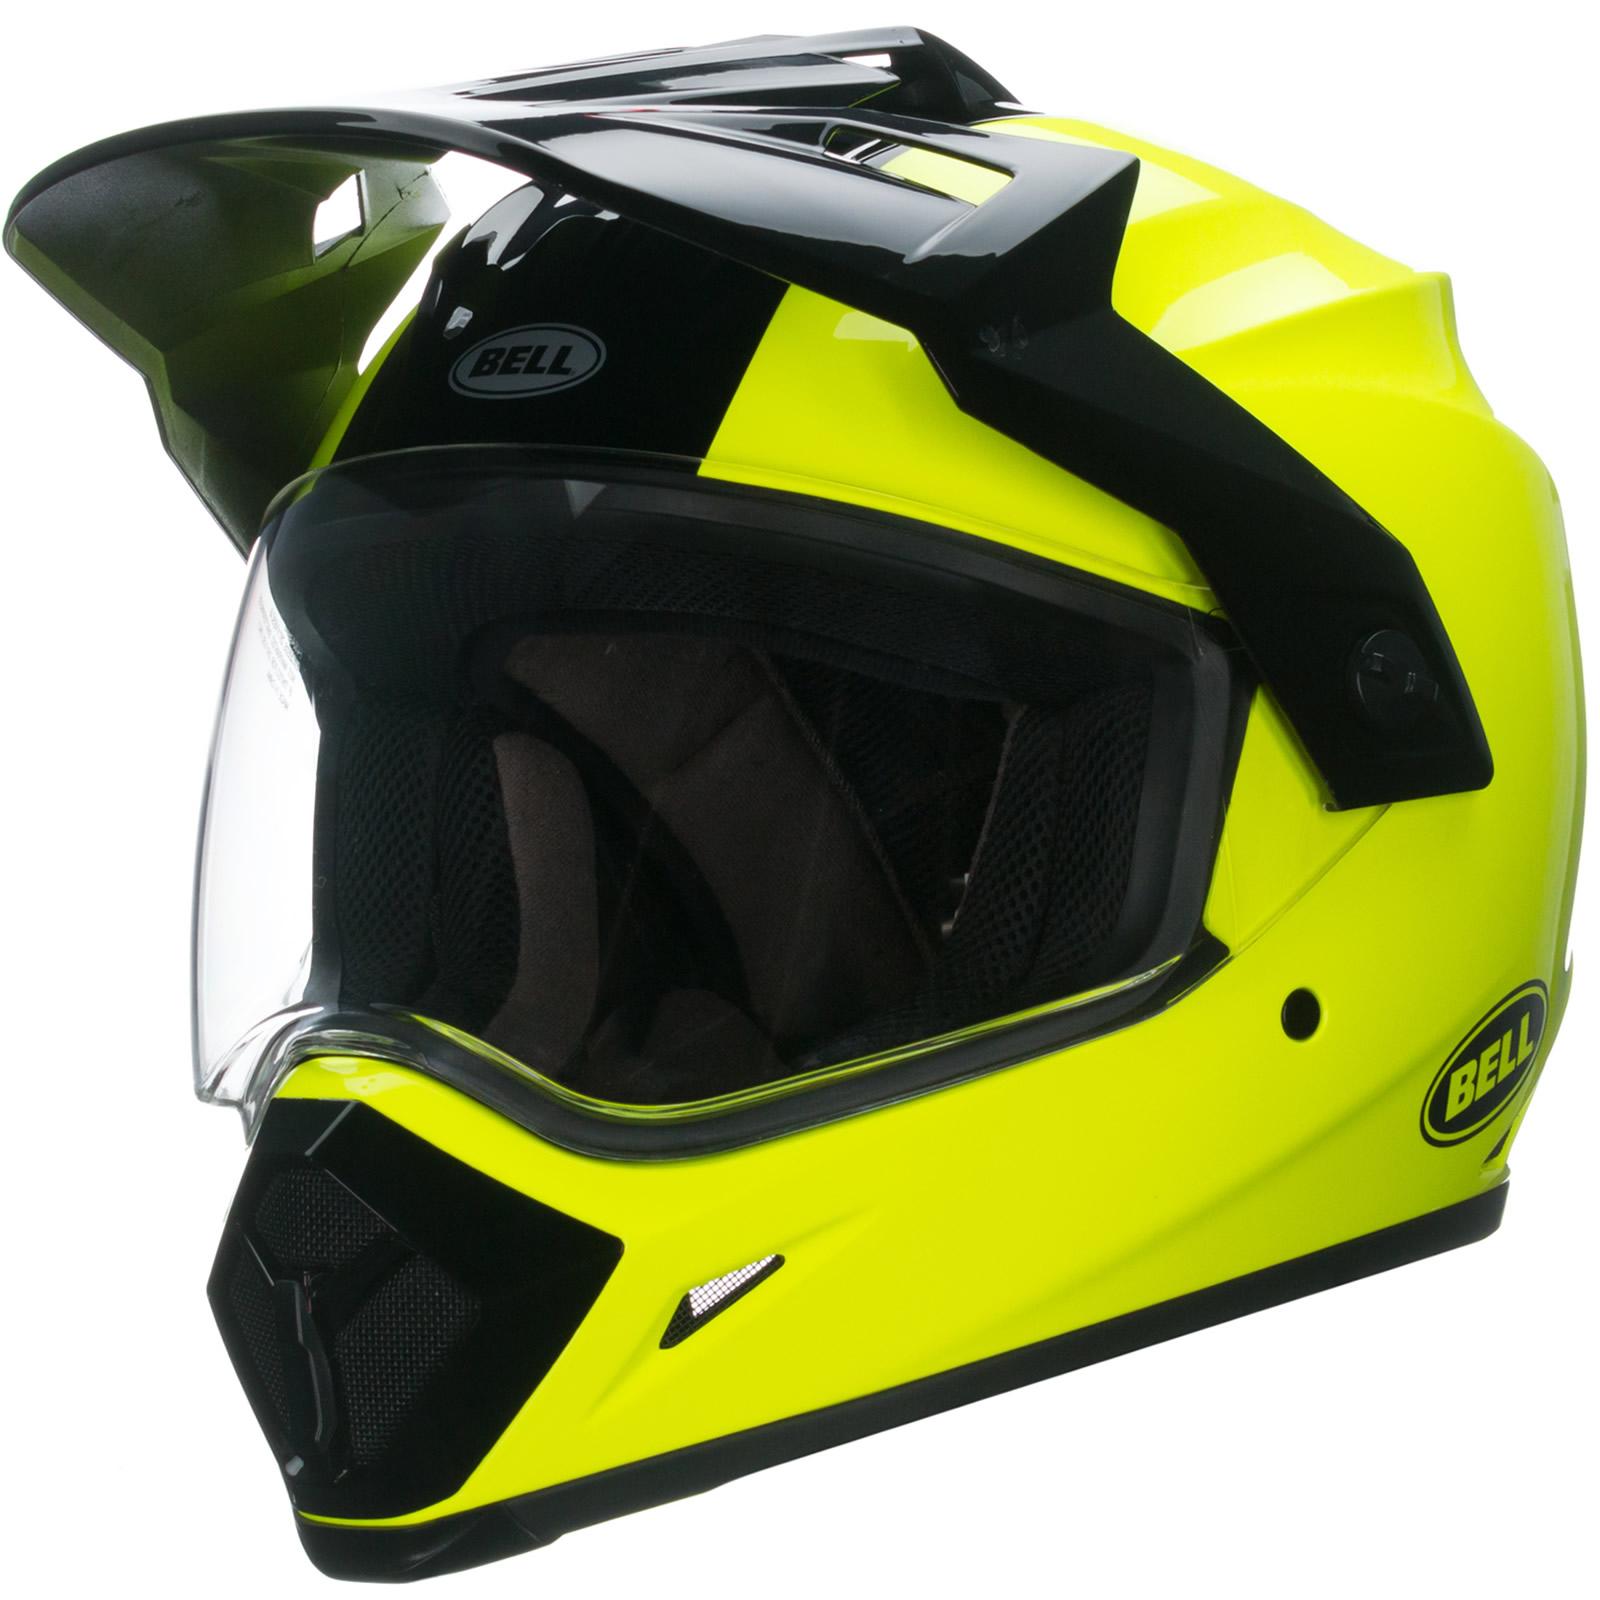 bell mx 9 adventure motocross helmet off road crash mx atv enduro ghostbikes ebay. Black Bedroom Furniture Sets. Home Design Ideas